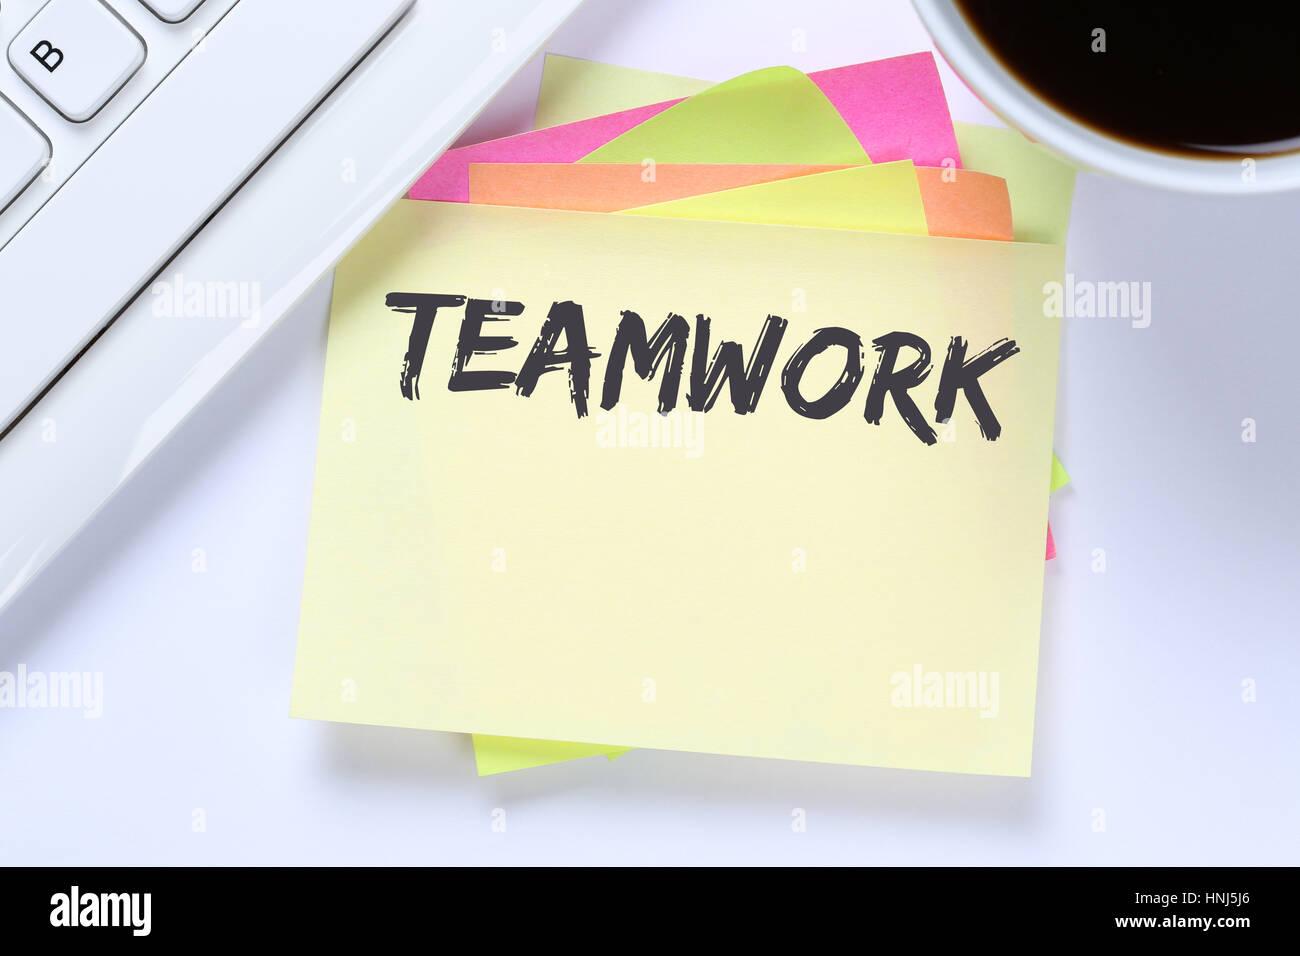 Teamwork team working together business success desk computer keyboard - Stock Image